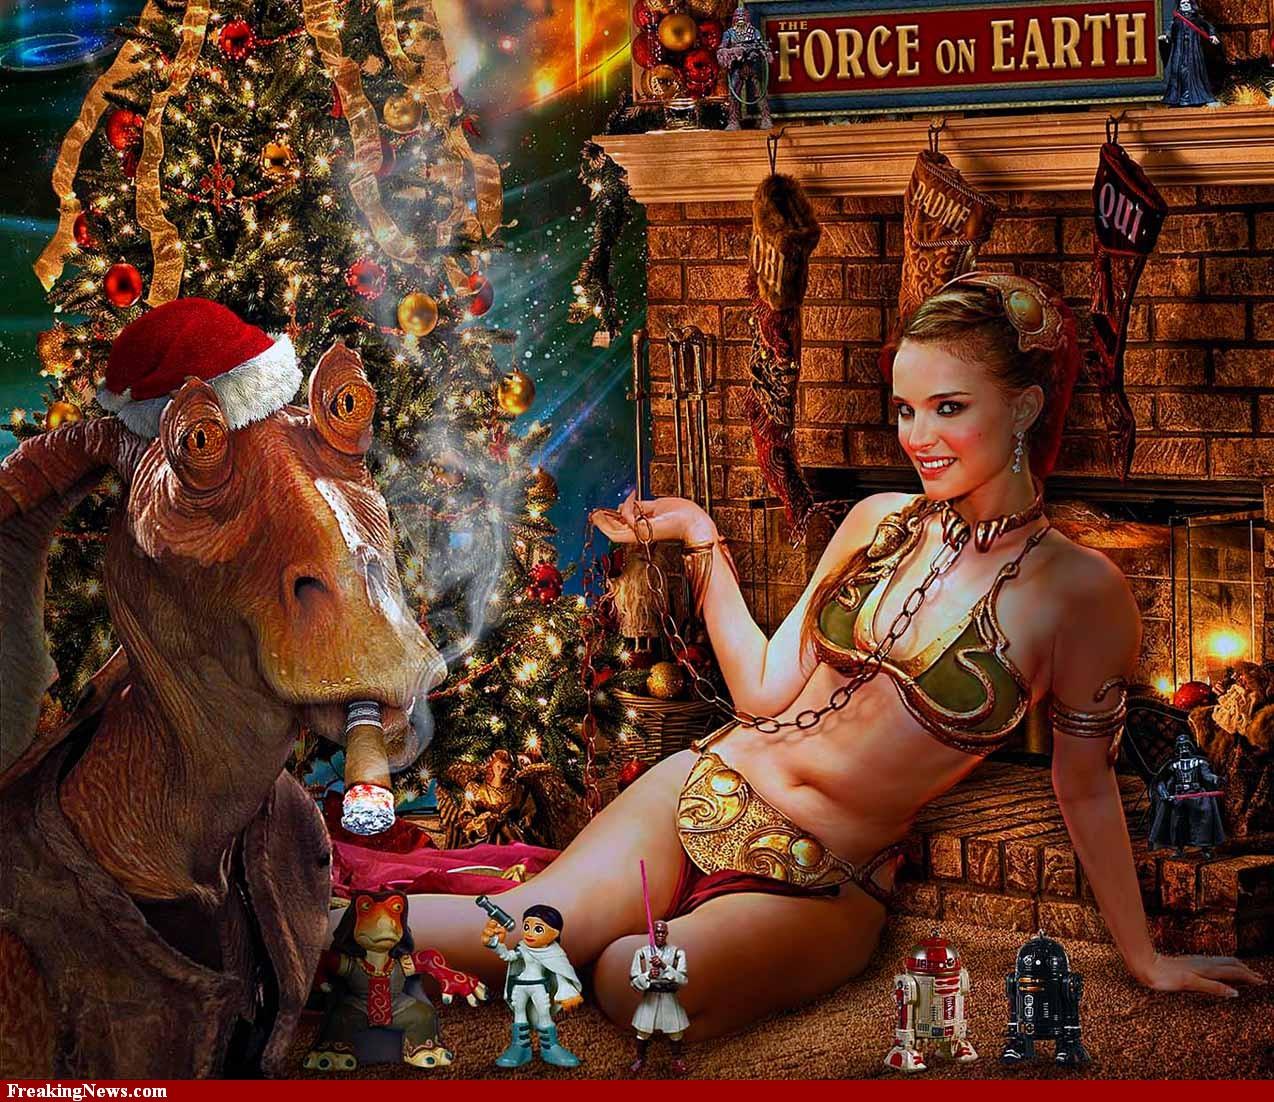 A-Star-Wars-Christmas-93518.jpg